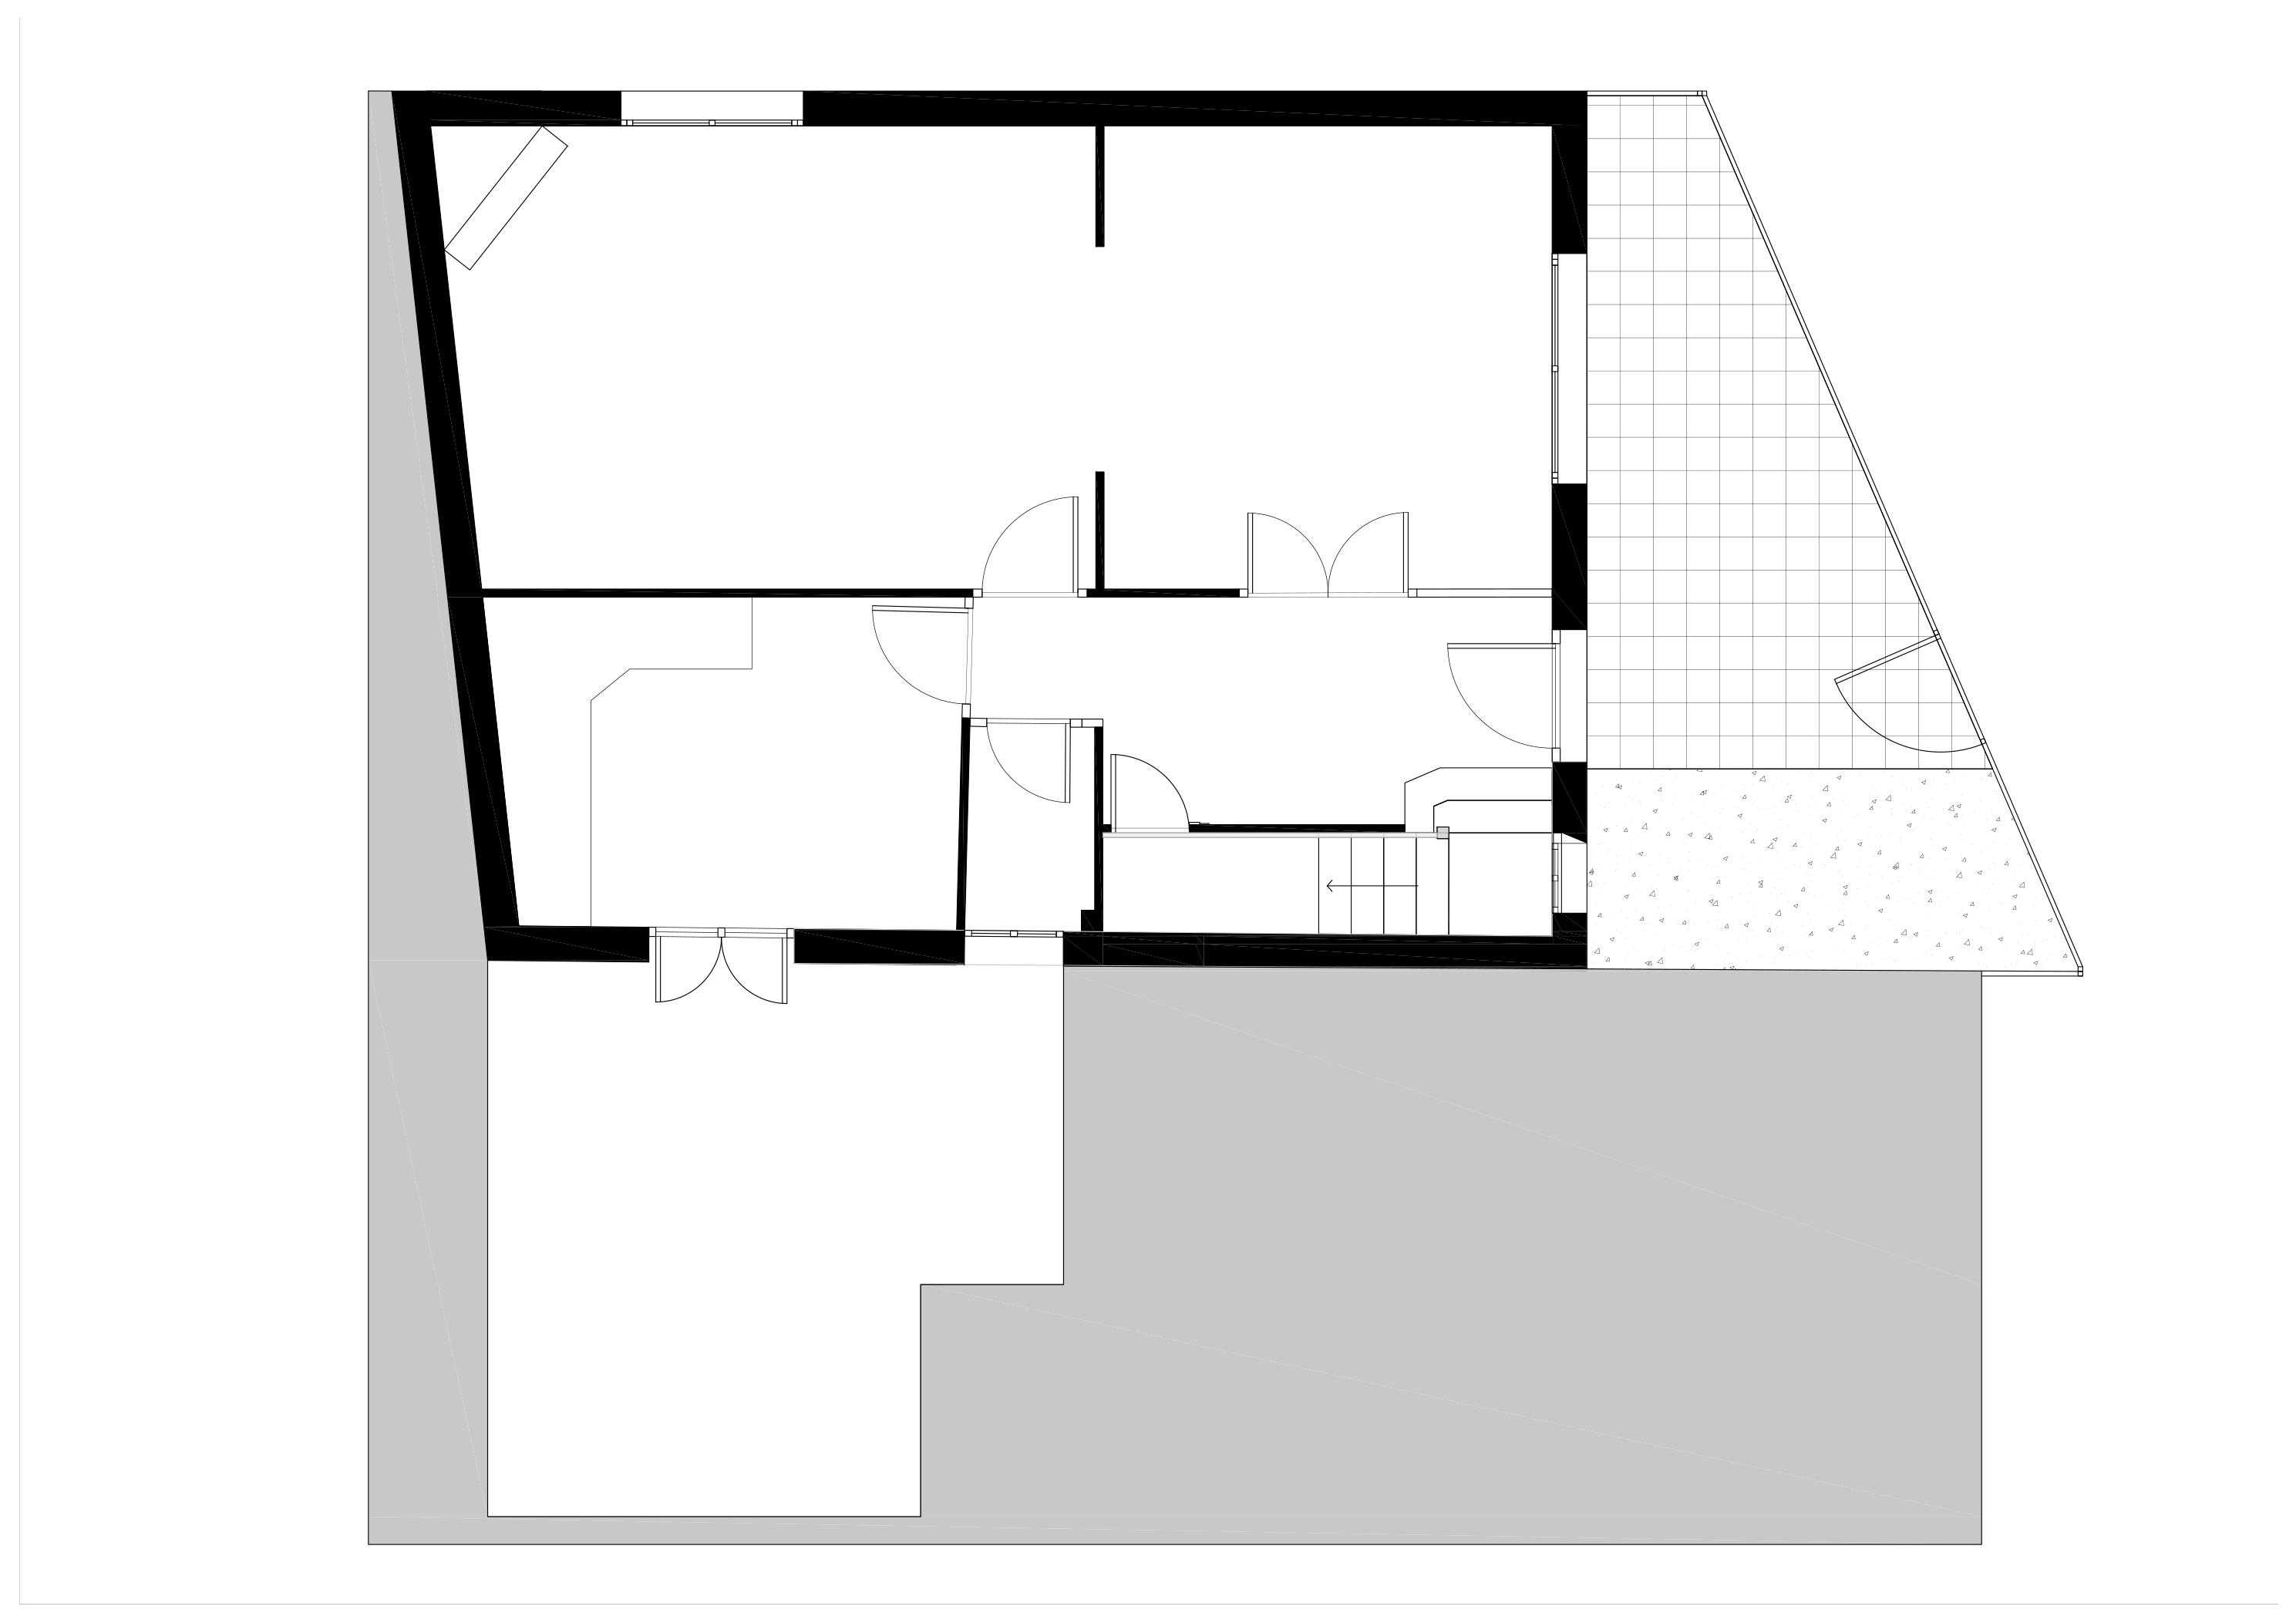 D:FREELANCELE HAILLANDWG170619-projet CUISINE LISTING (4) (1